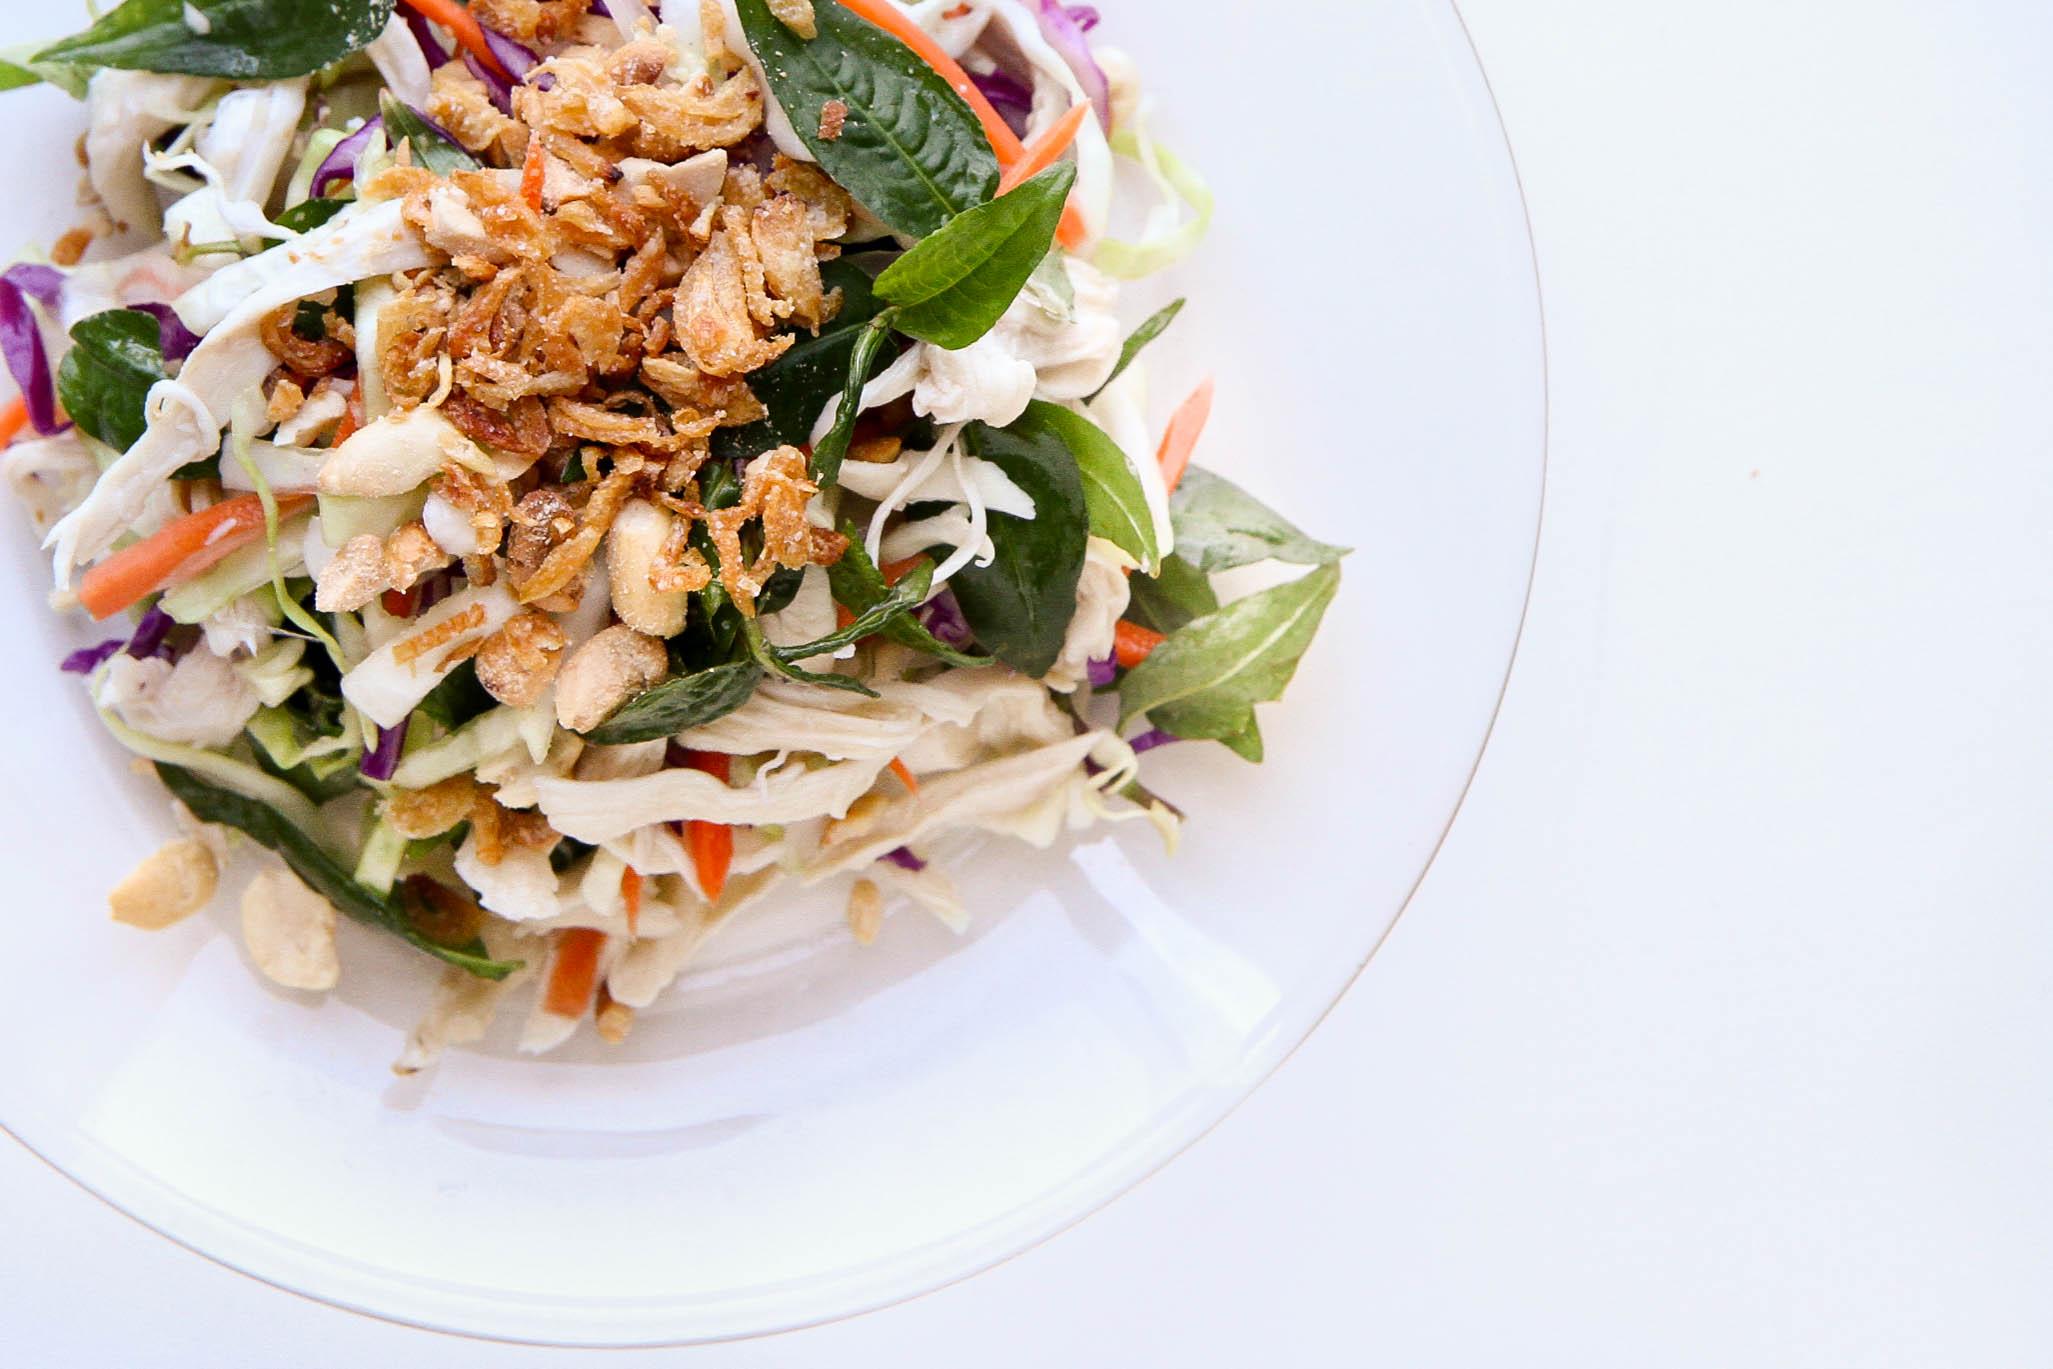 Vietnamese Chicken Salad (Gỏi Gà Bắp Cải)